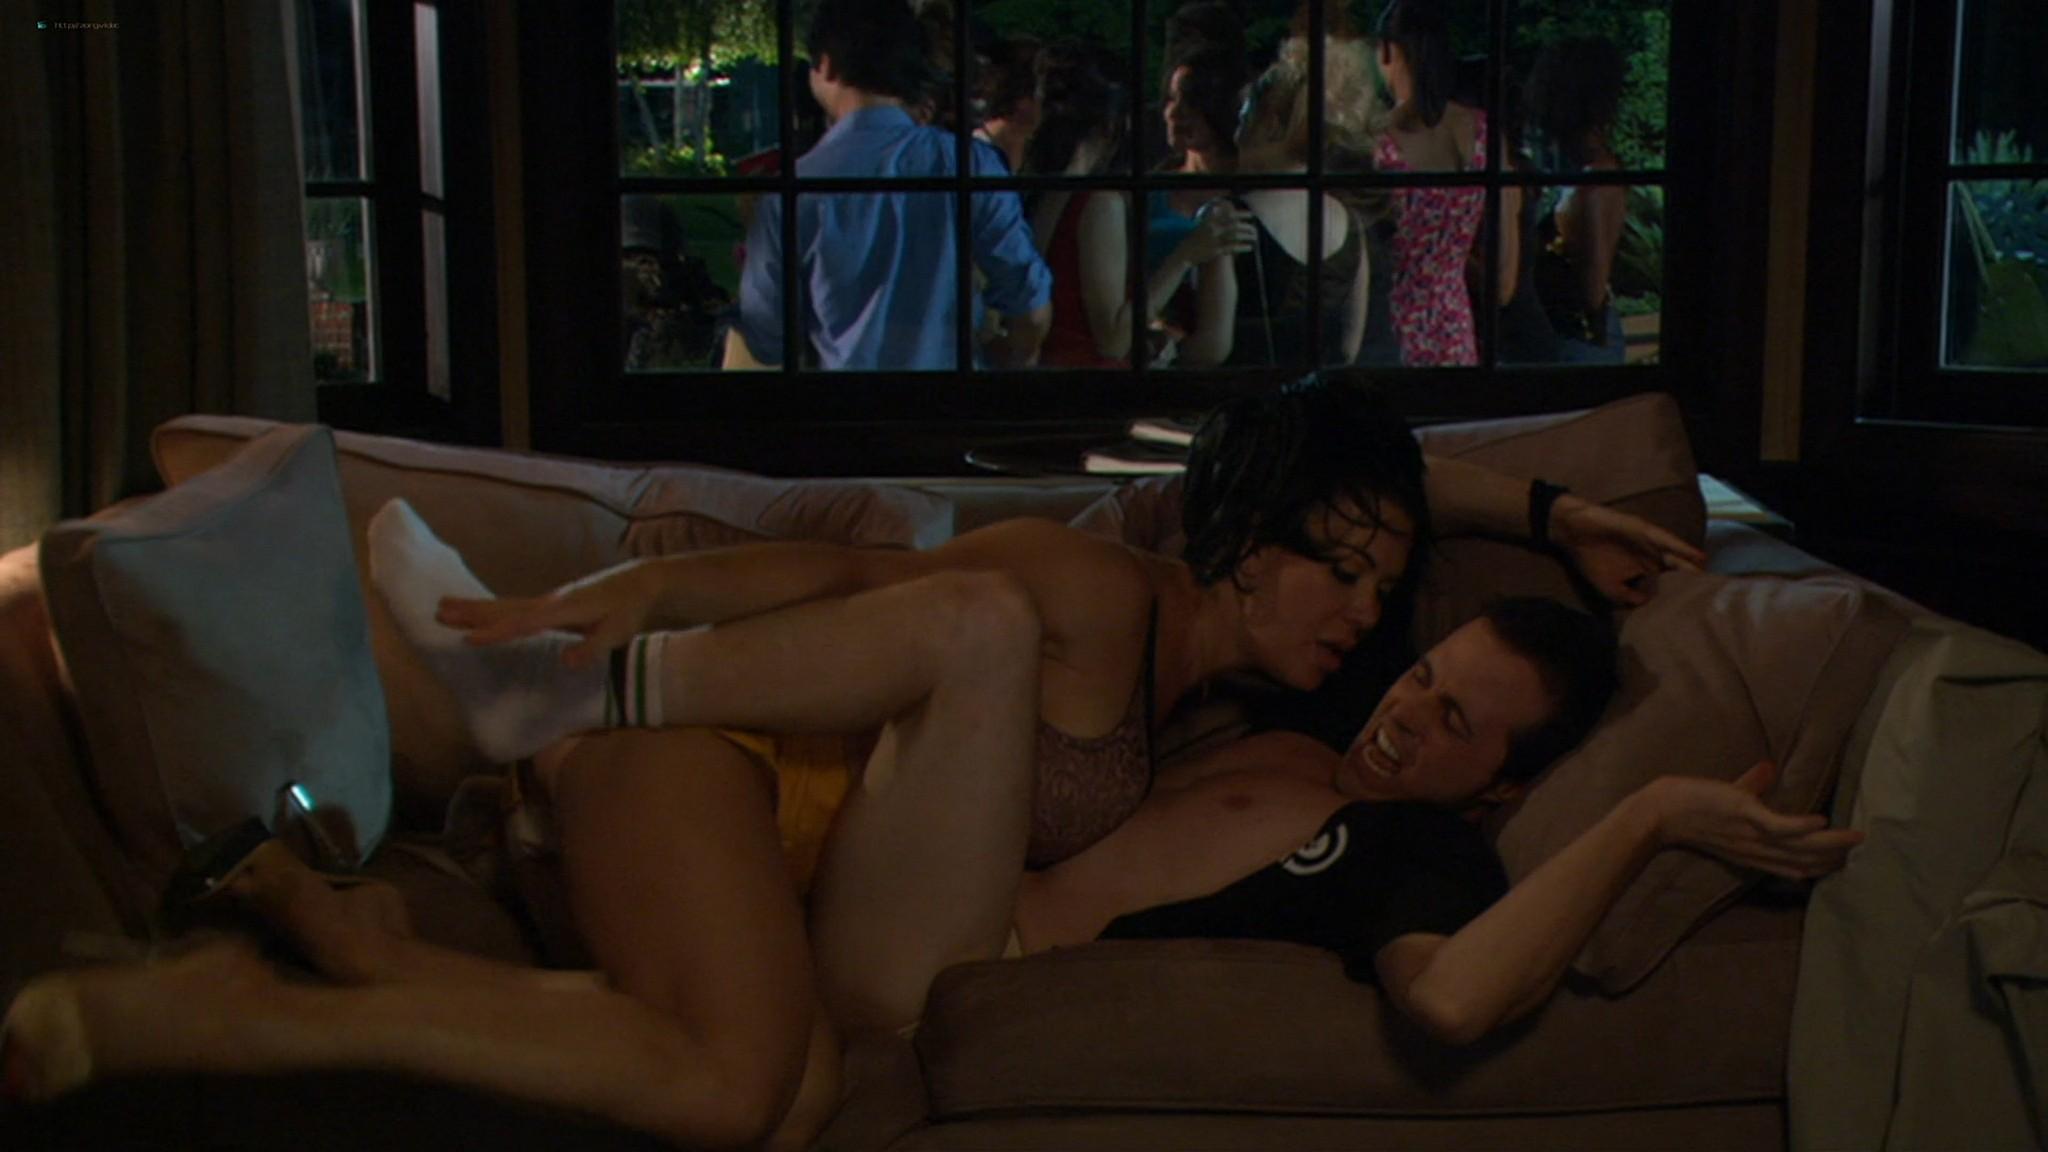 Kaley Cuoco hot Izabella Scorupco sexy others nude - Cougar Club (2007) HD 1080p BluRay (10)